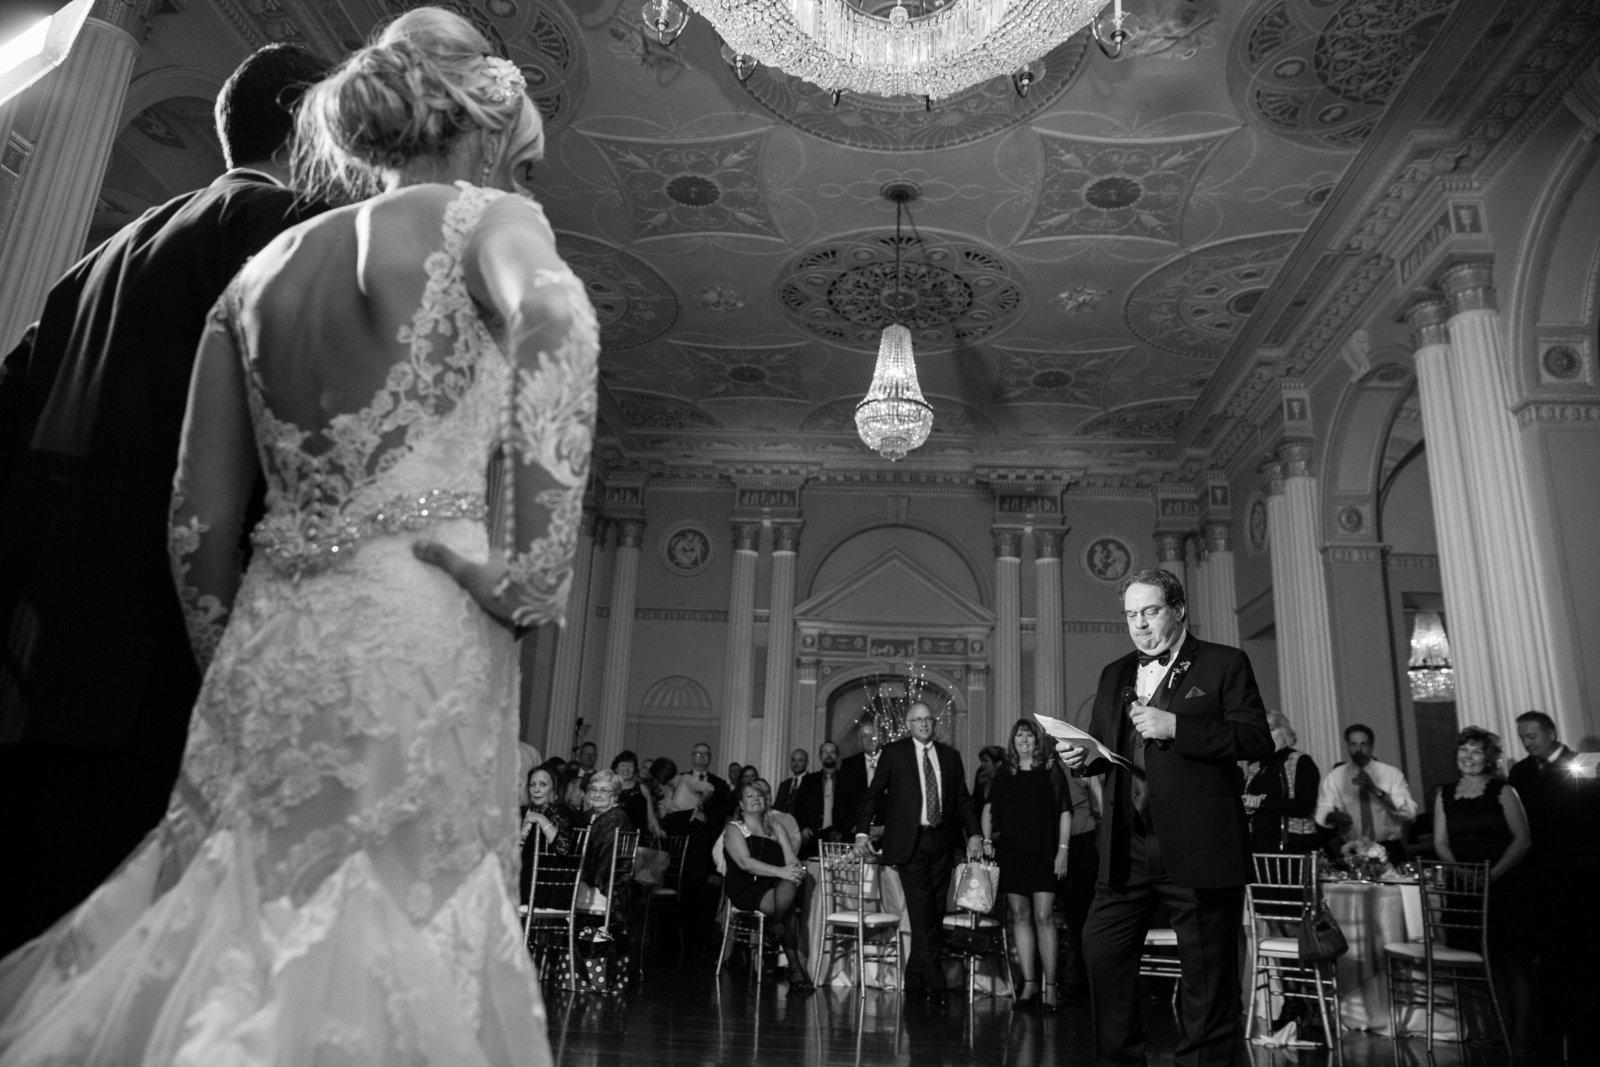 biltmore-ballroom-wedding-atlanta-fathers-toast